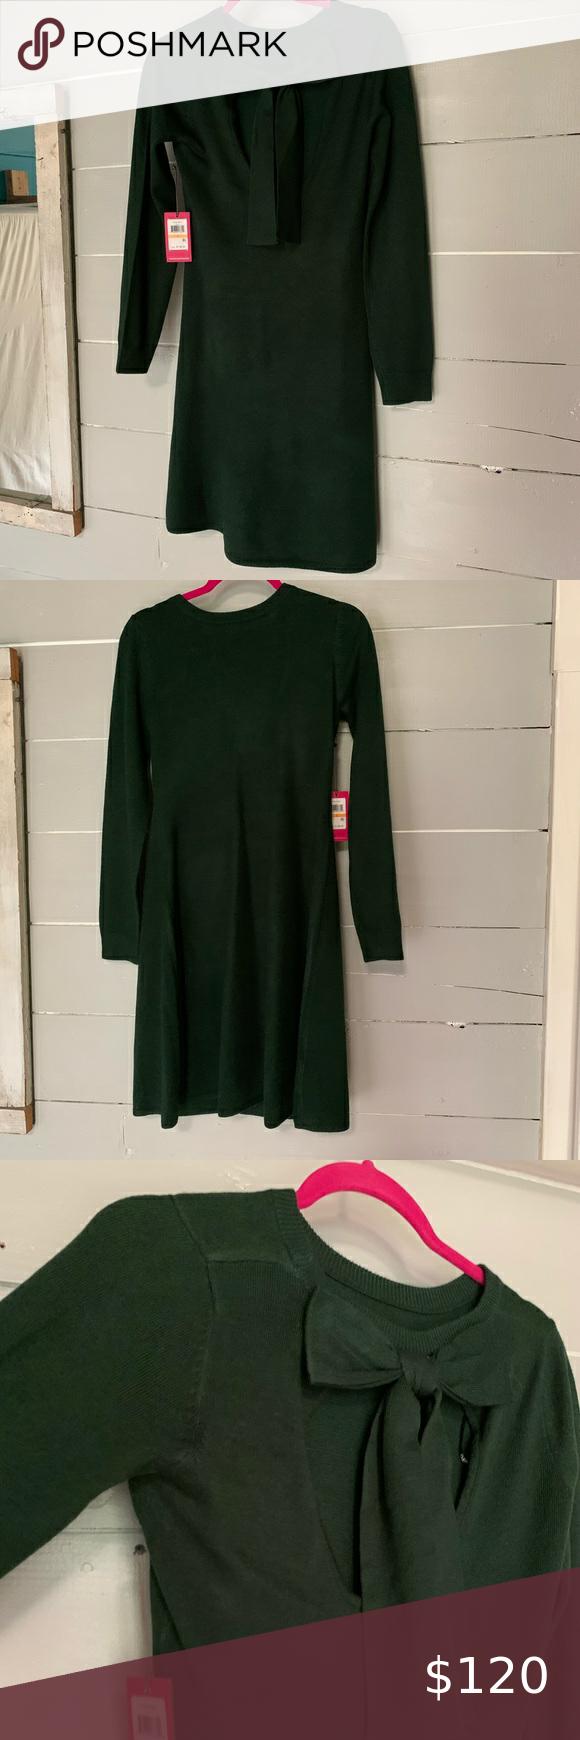 Nwt Vince Camuto Hunter Green Dress Hunter Green Dresses Flattering Fashion Clothes Design [ 1740 x 580 Pixel ]